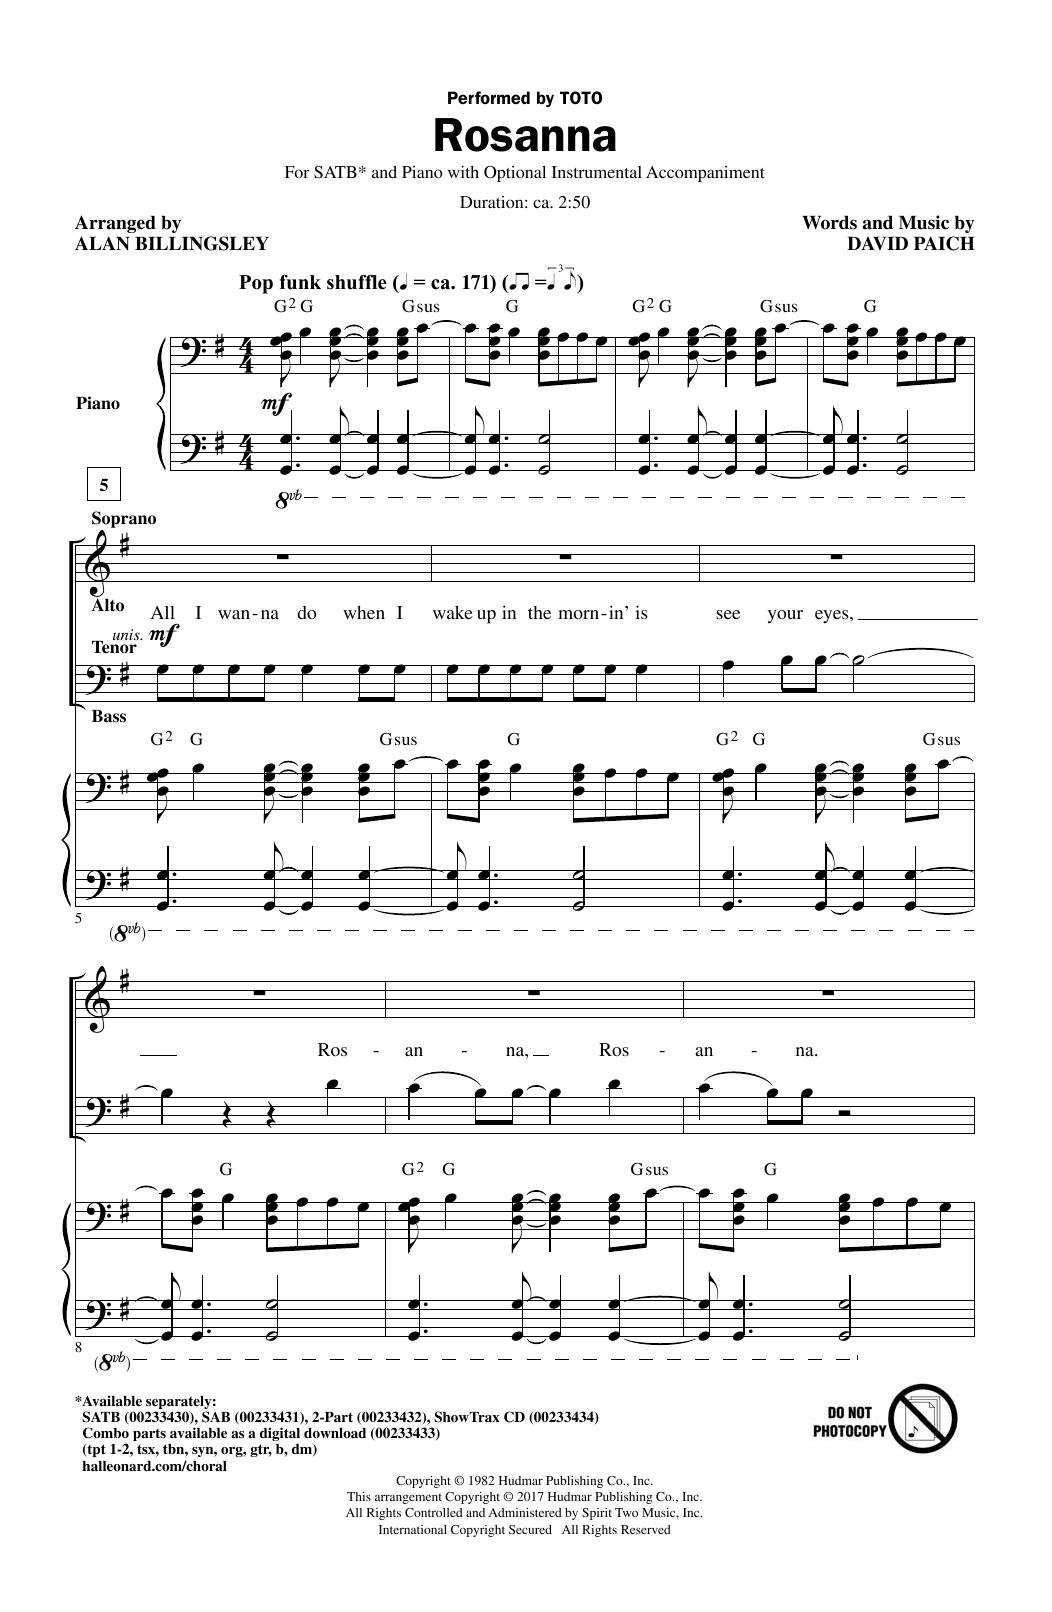 Rosanna (SATB Choir)